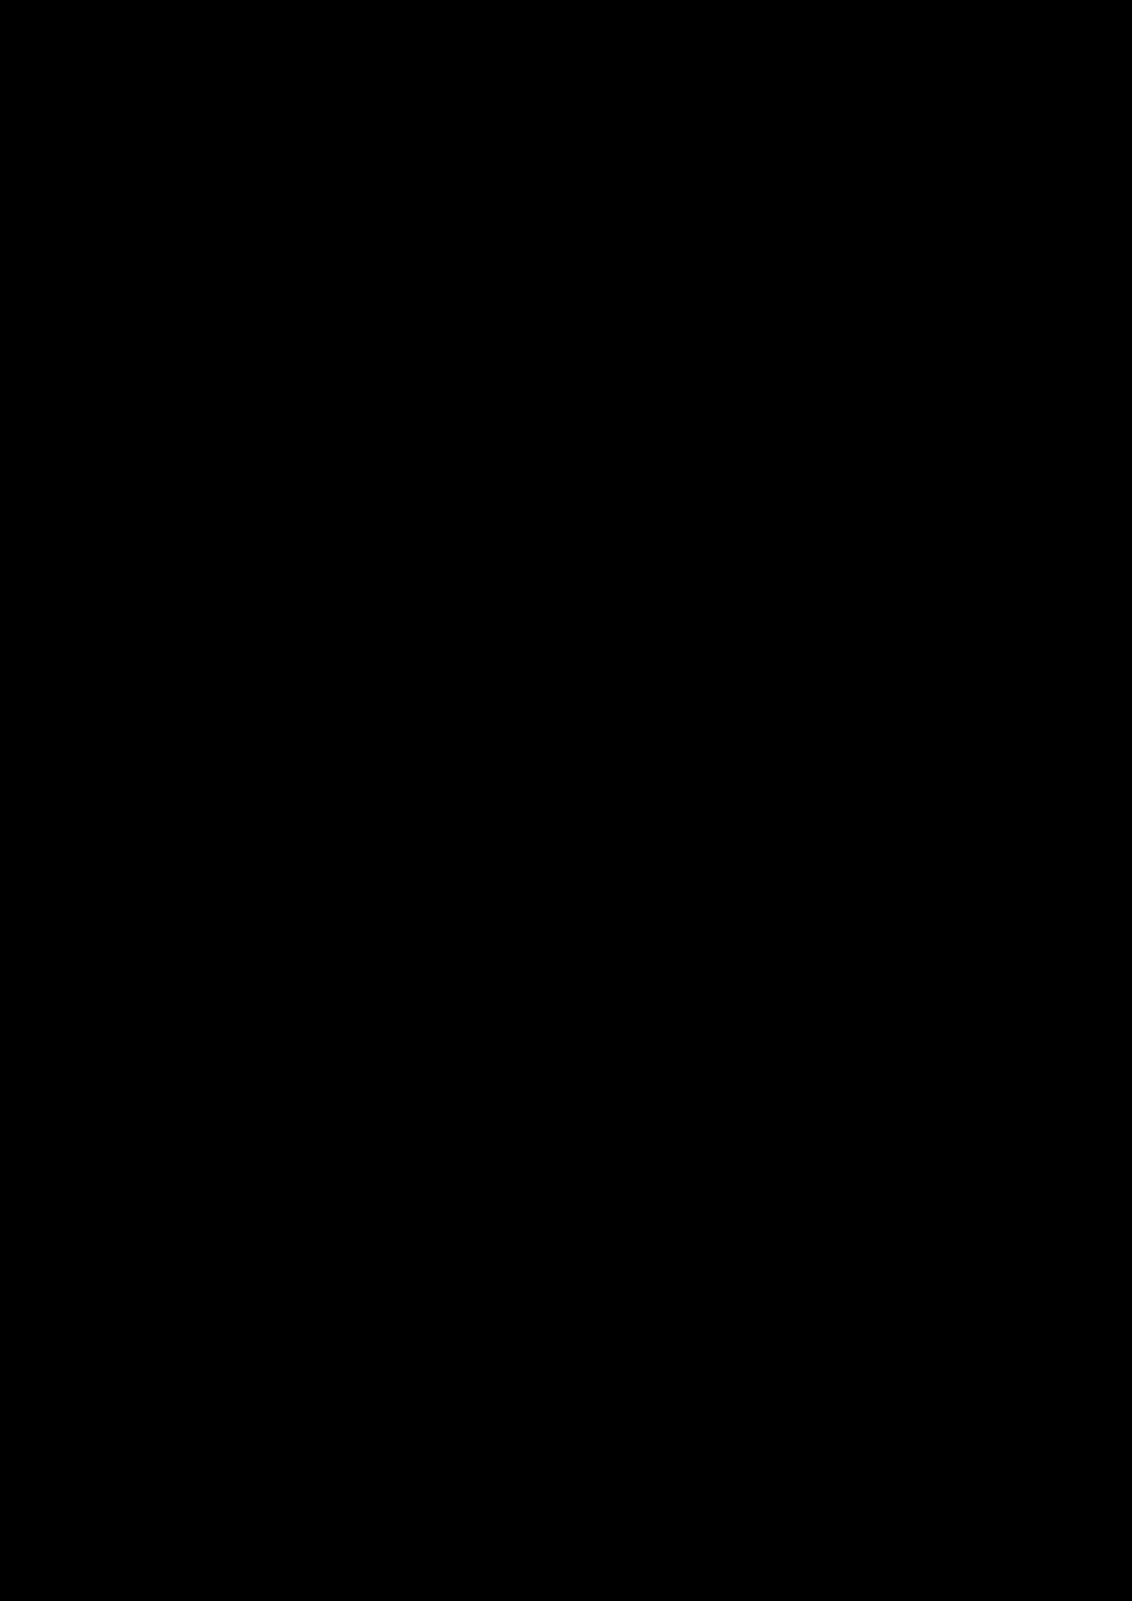 Ispoved Pervogo Boga slide, Image 38